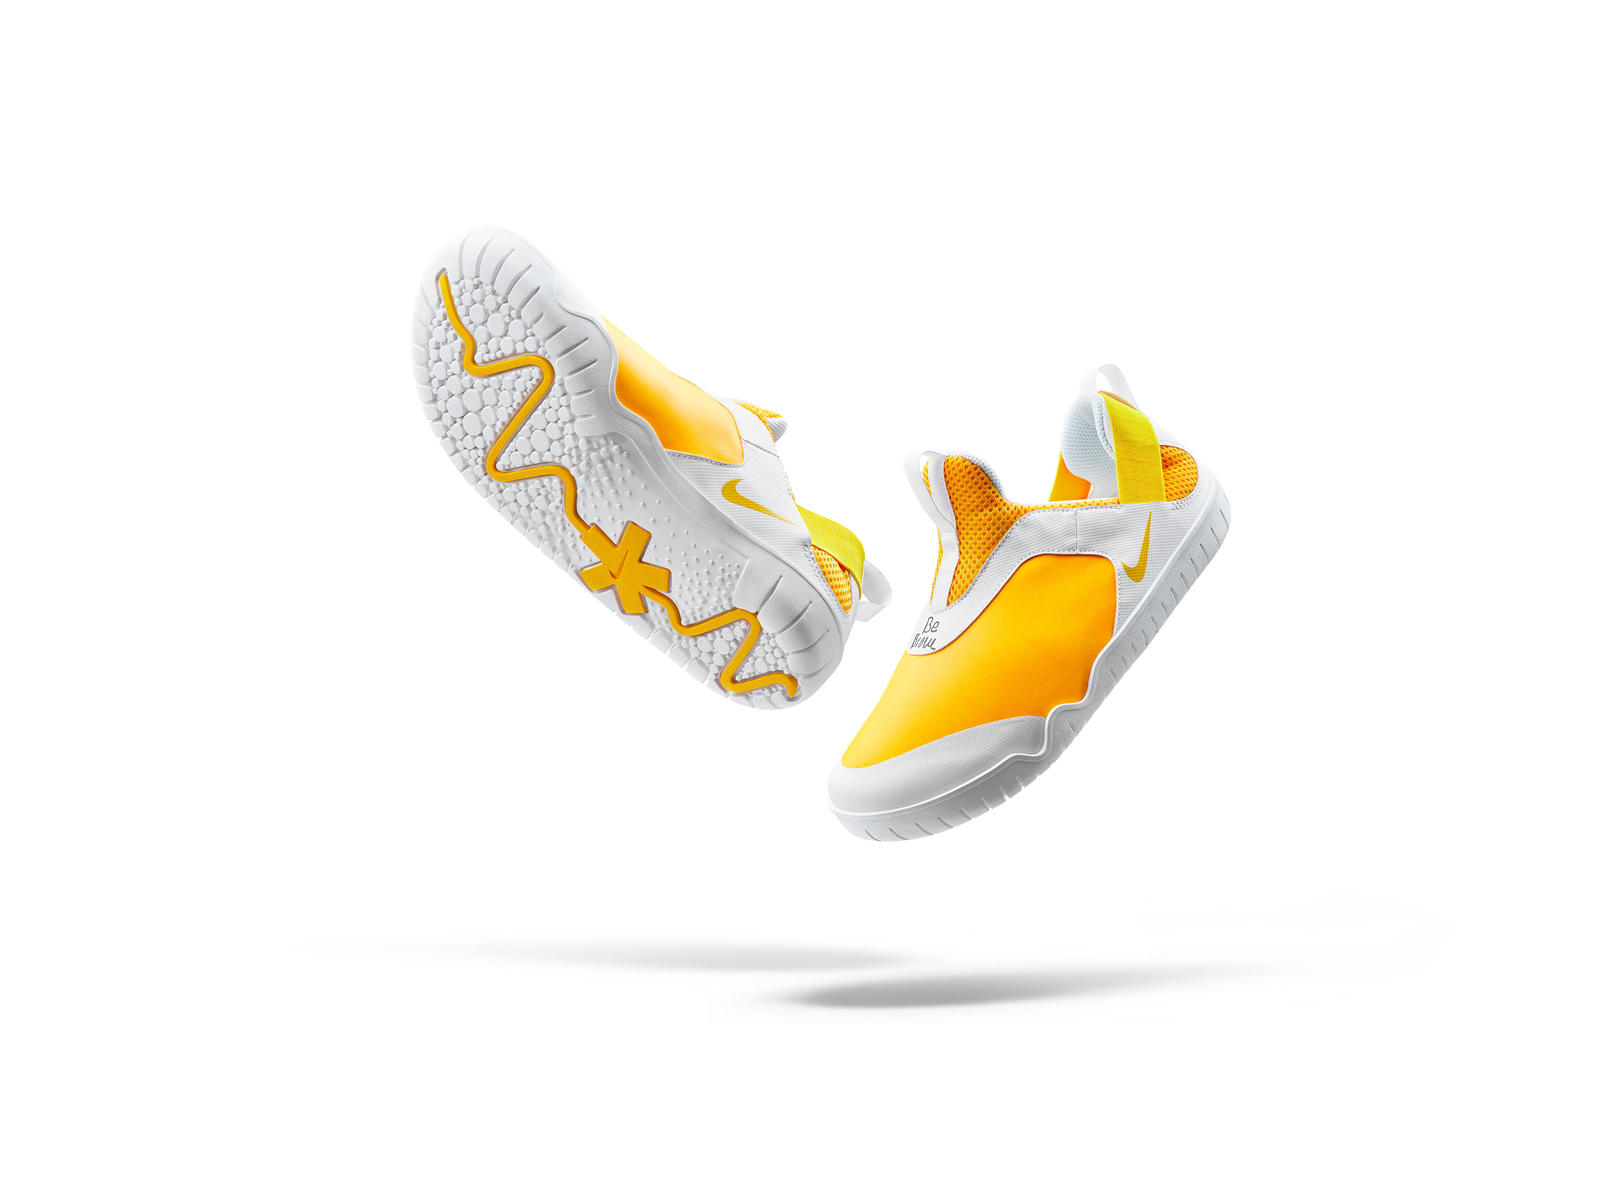 NikeNews_DoernbecherFreestyle2019_AirZoomPulse_Zion_XVI_13309_91594